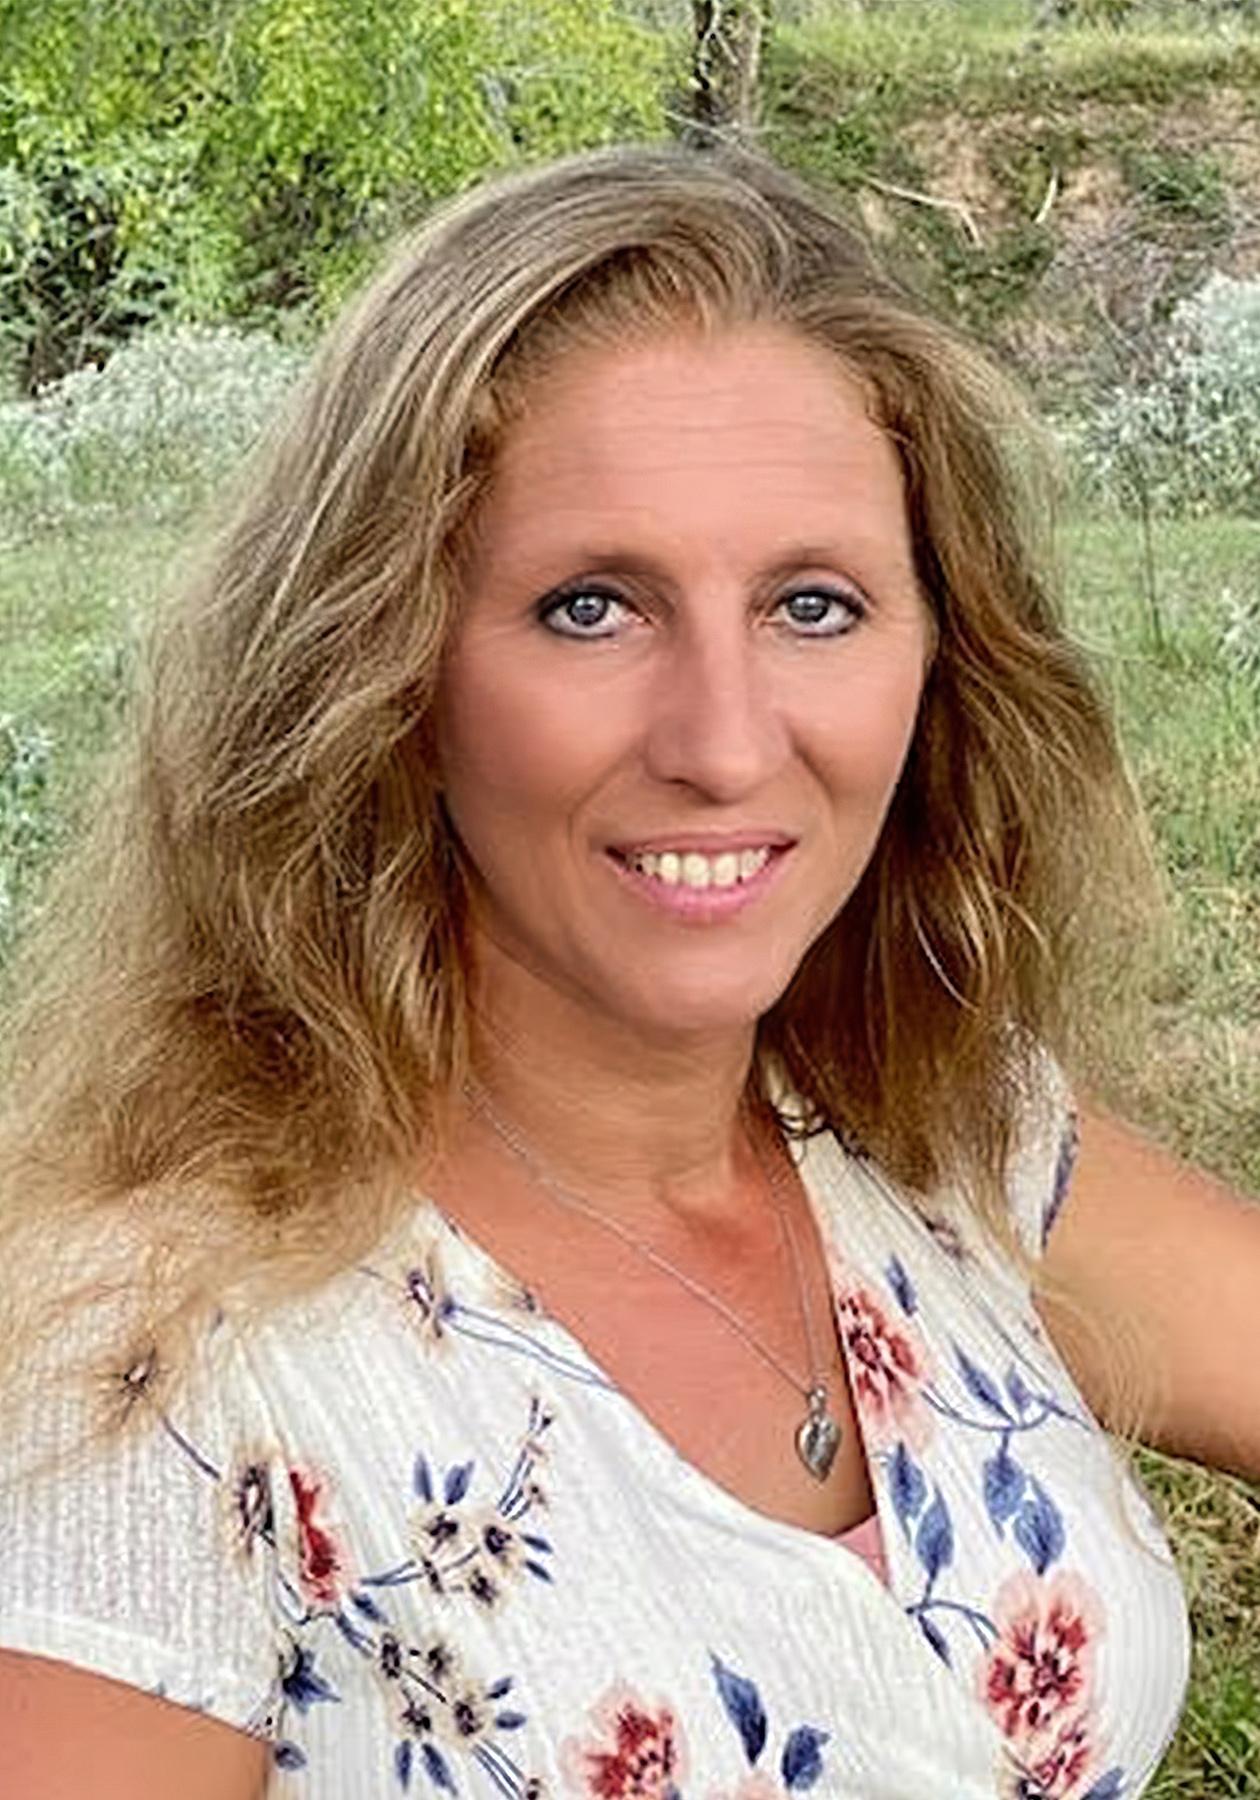 Melanie Hargis